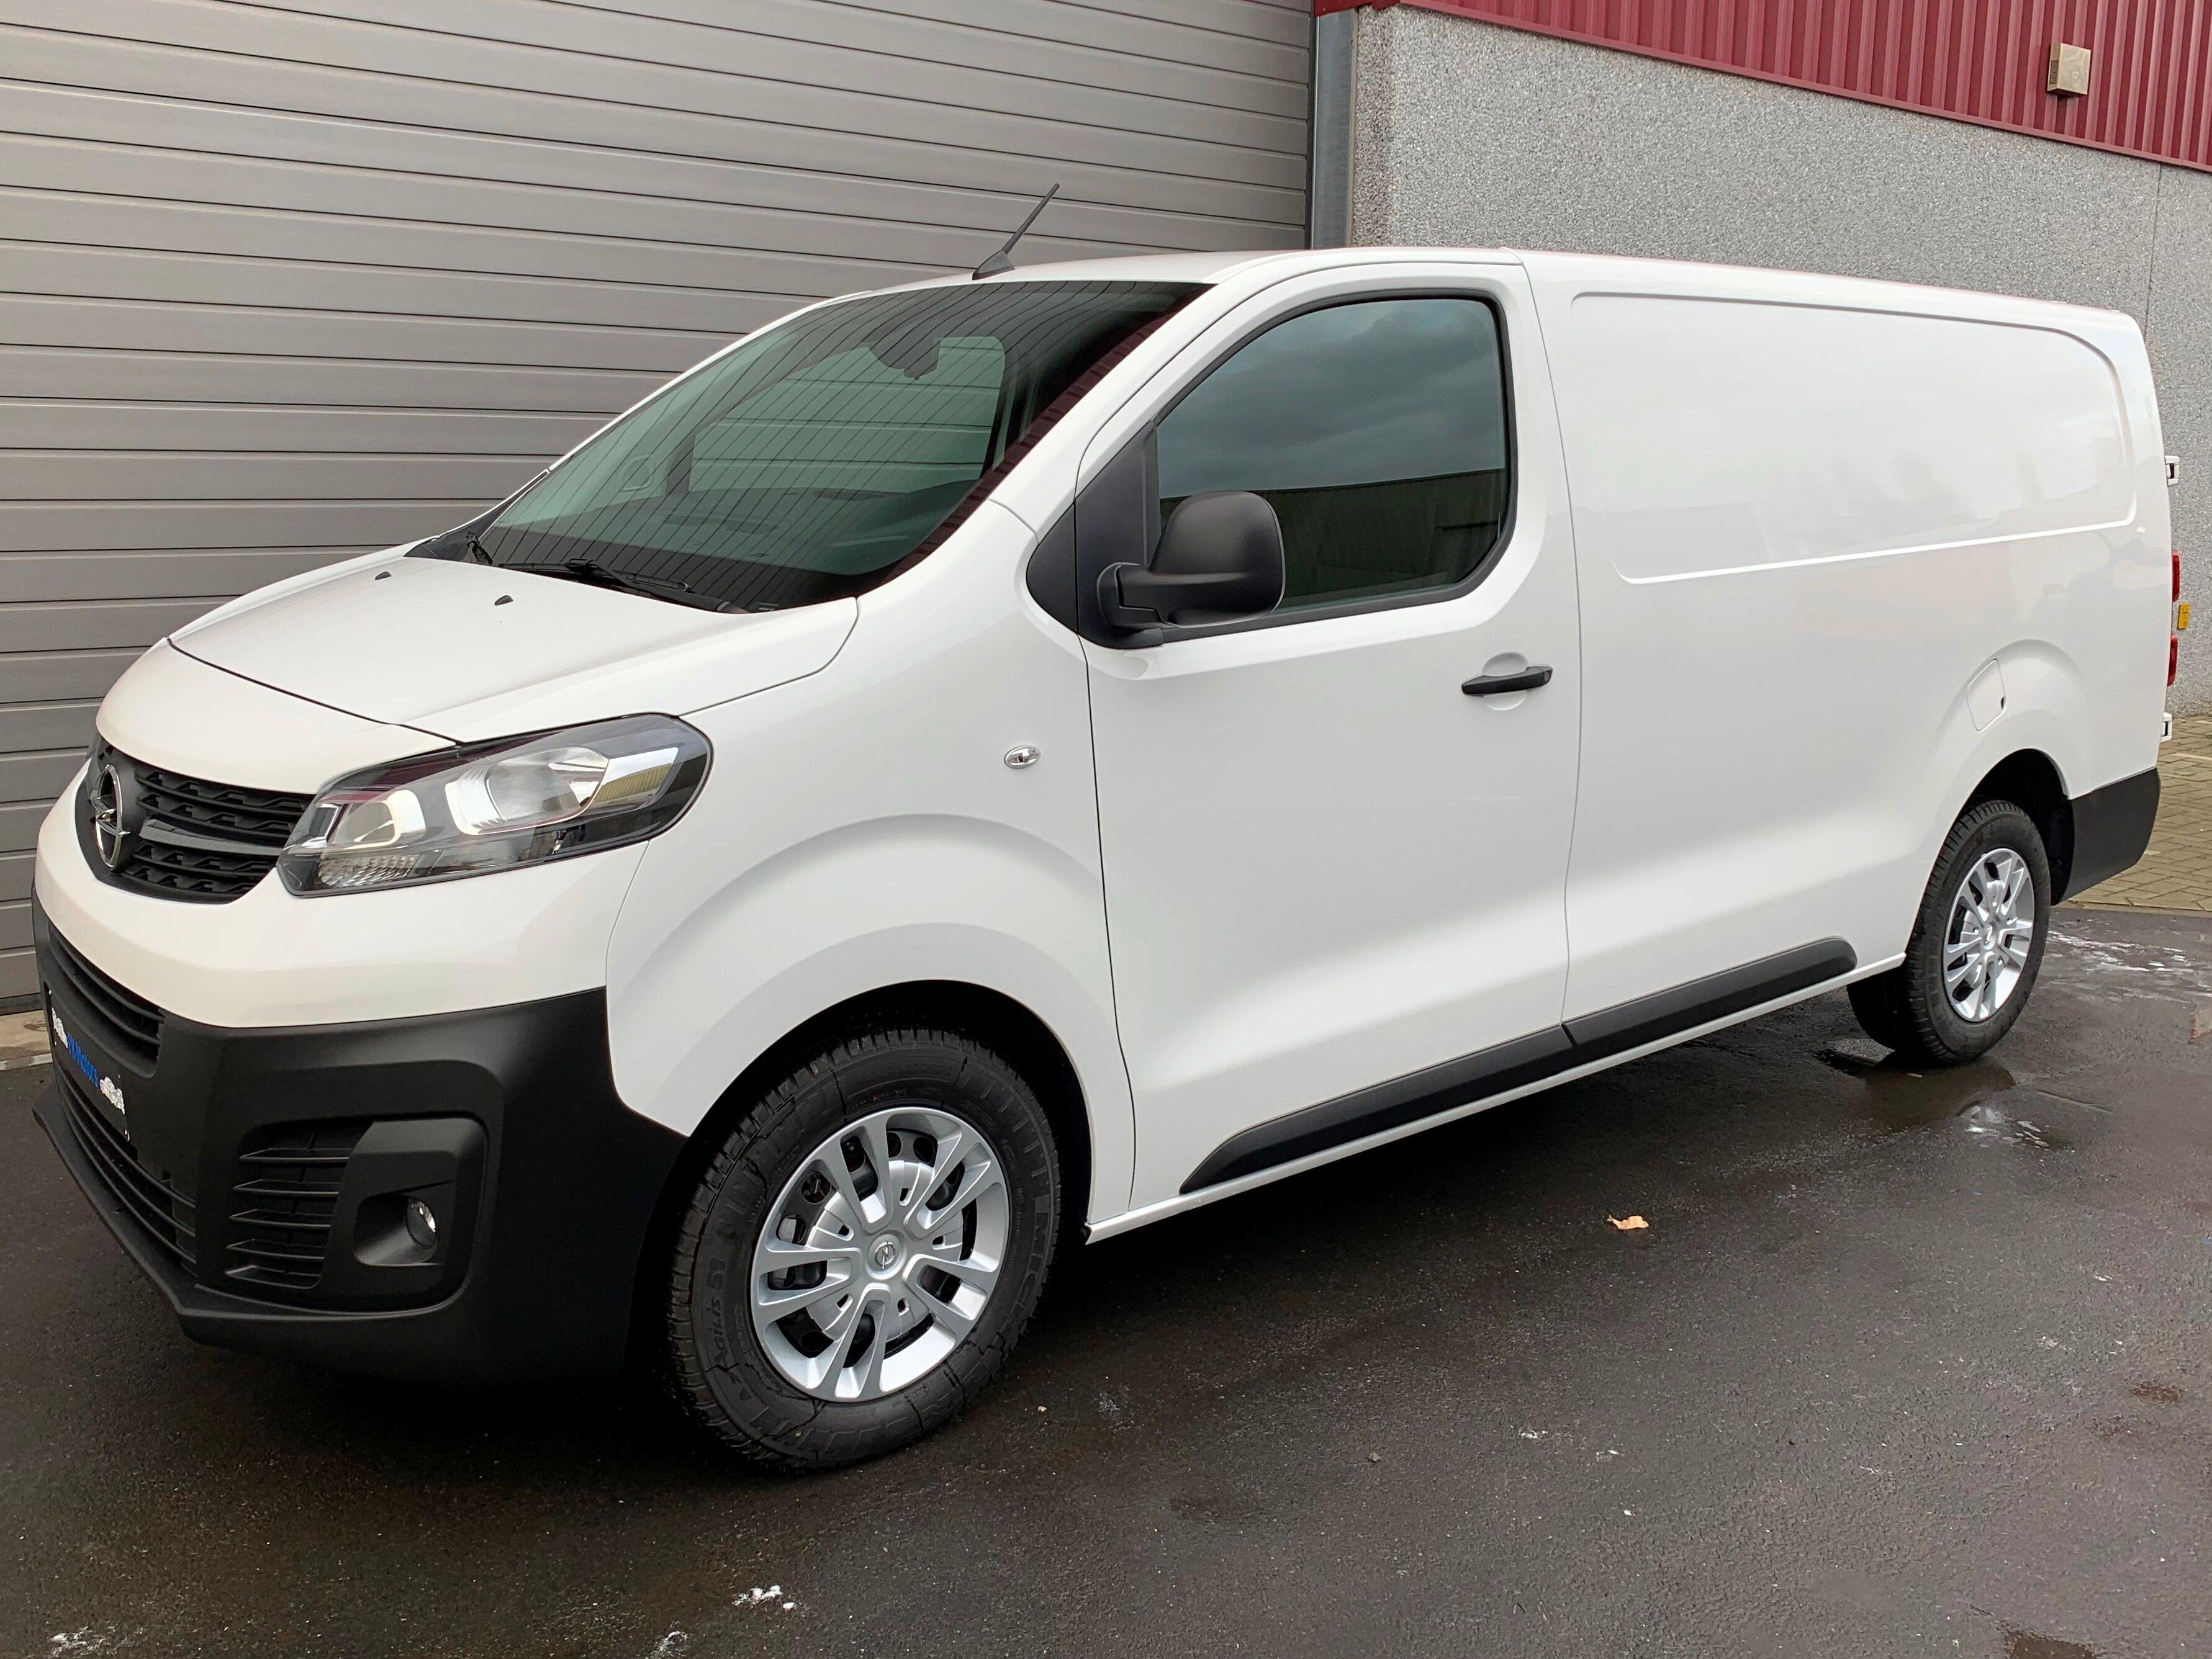 Opel Vivaro 2.0D 122PK Edition L3H1 NIEUW in stock 35% korting 2/29